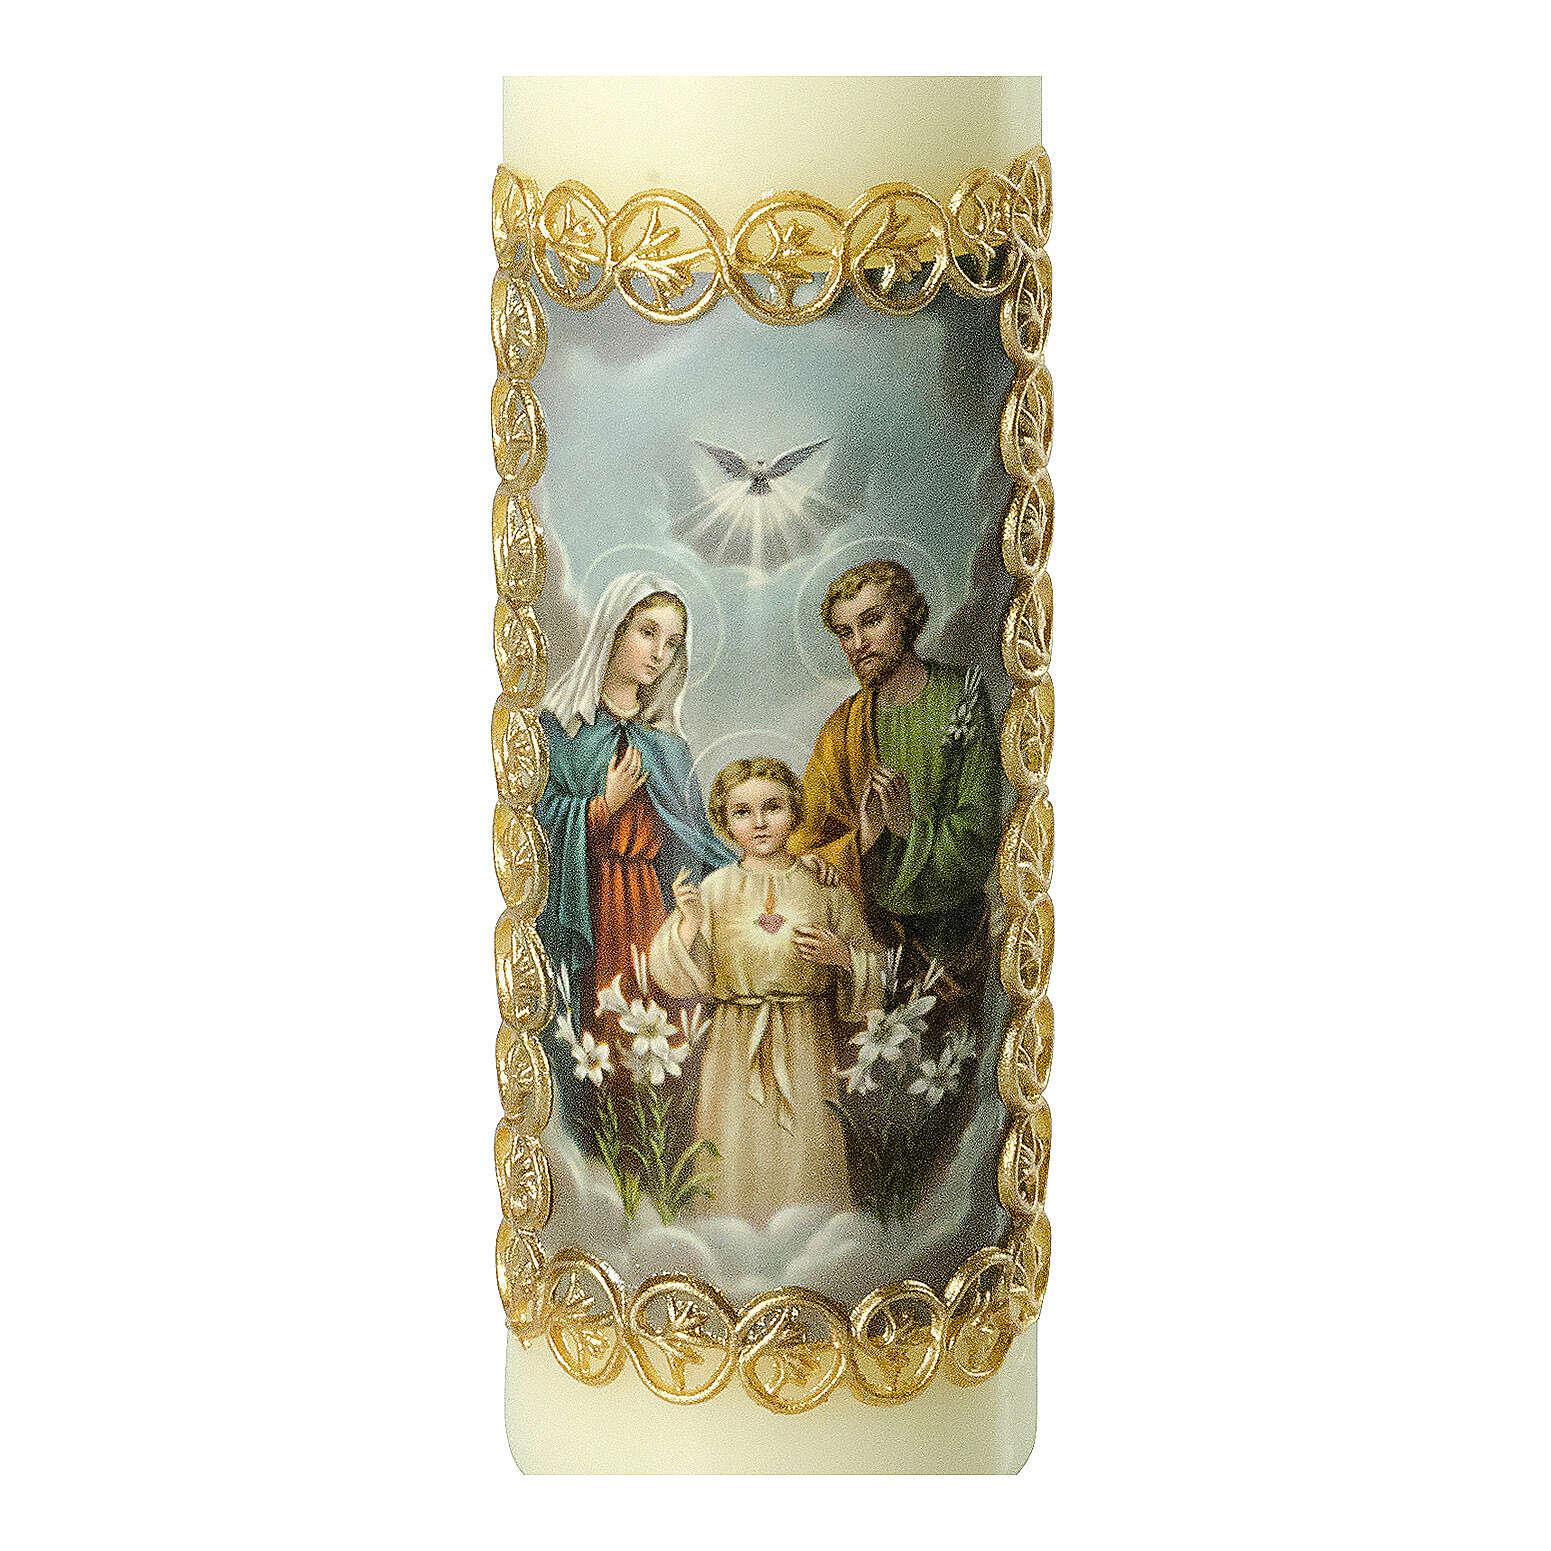 Kerze Heilige Familie goldener Rahmen, 165x50 mm 3